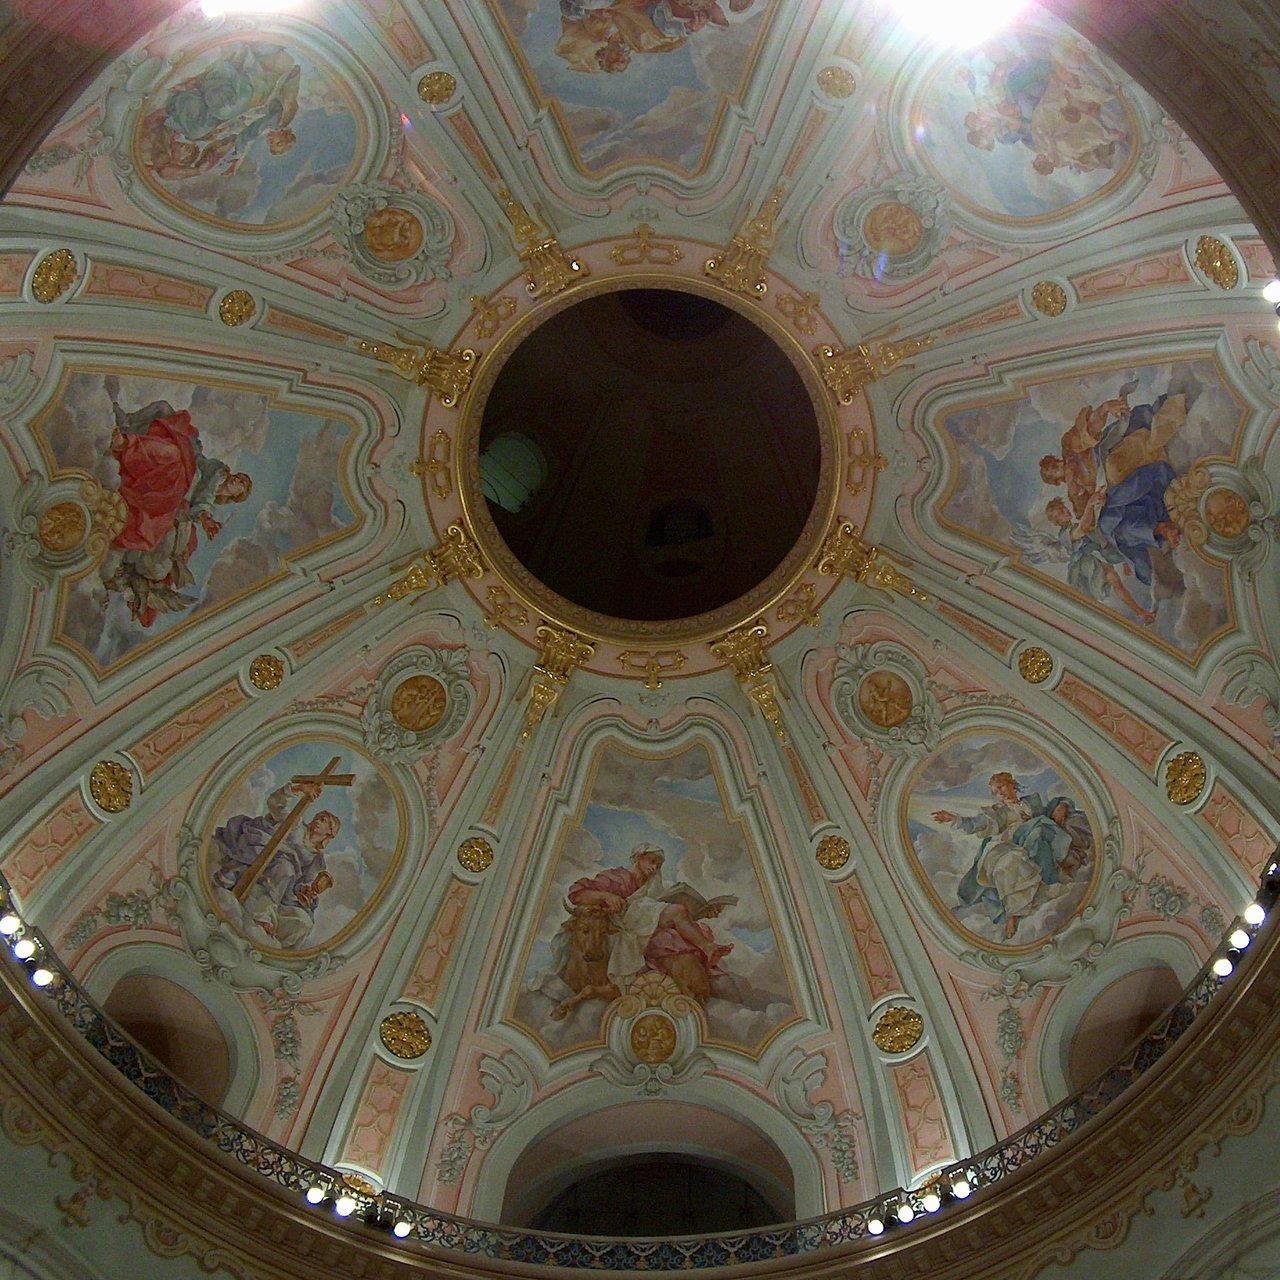 Blick in die Kuppel der Frauenkirche in Dresden